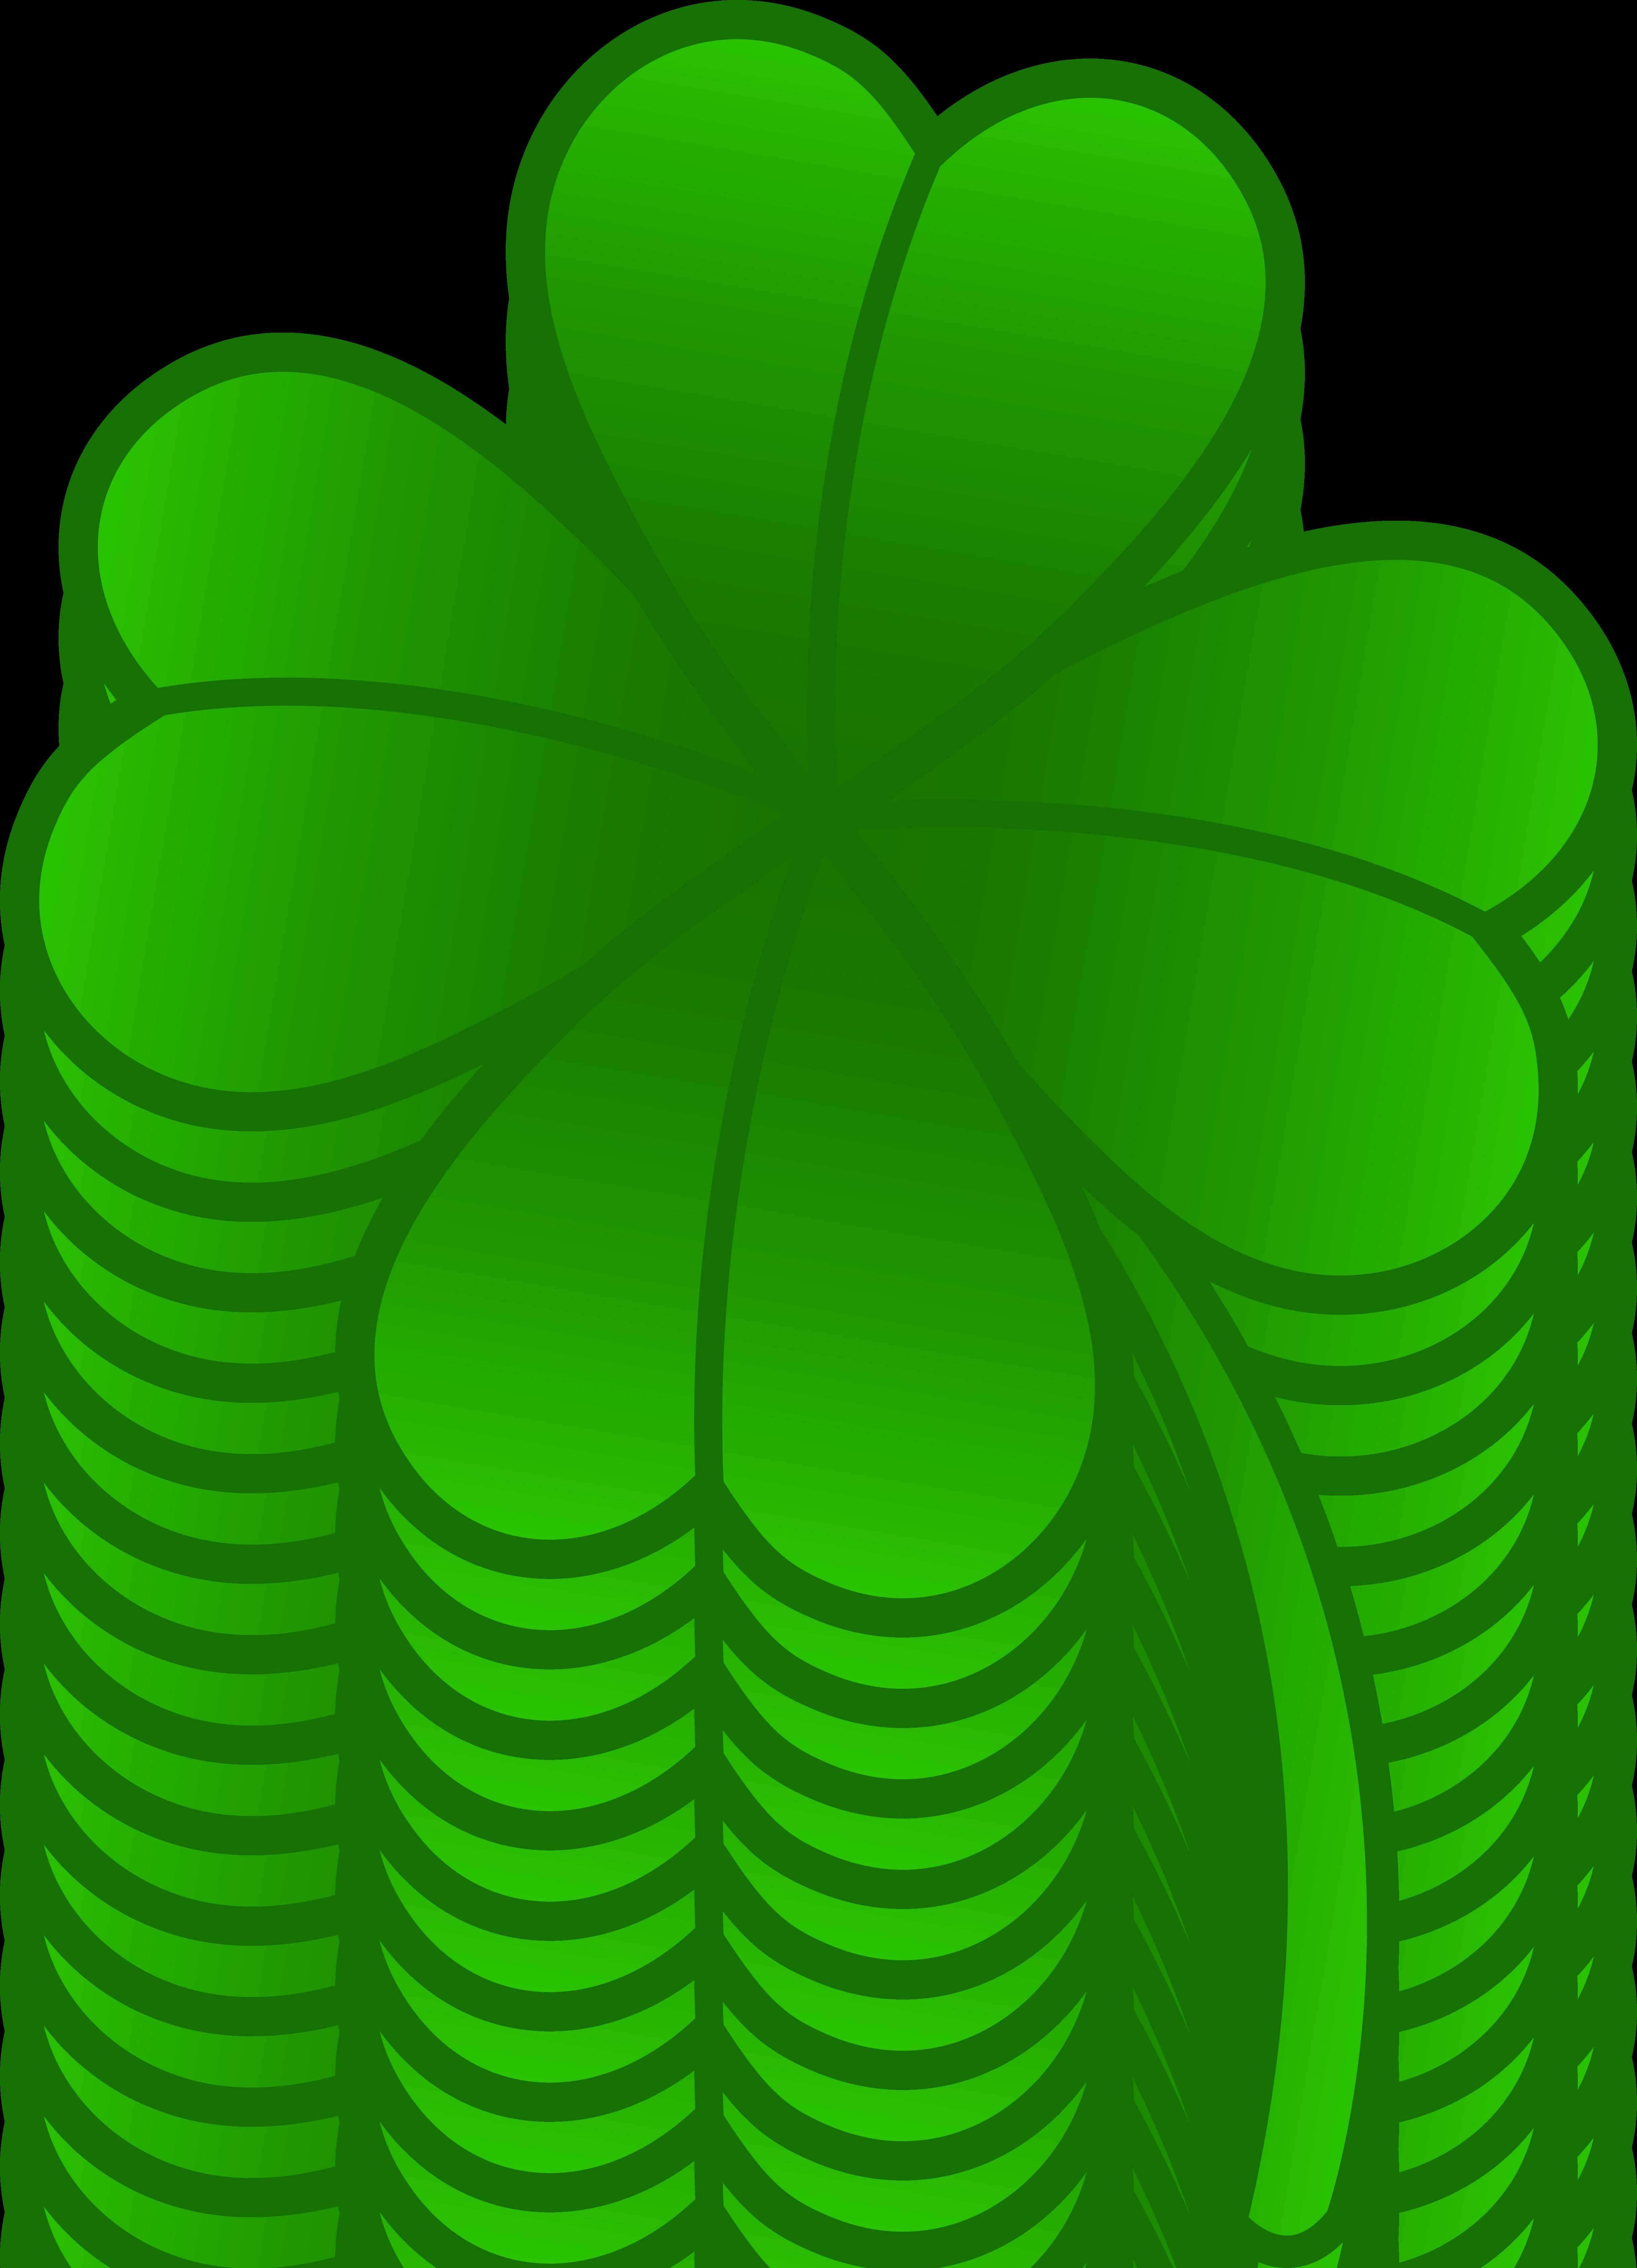 Green Four Leaf Clover - Free Clip Art